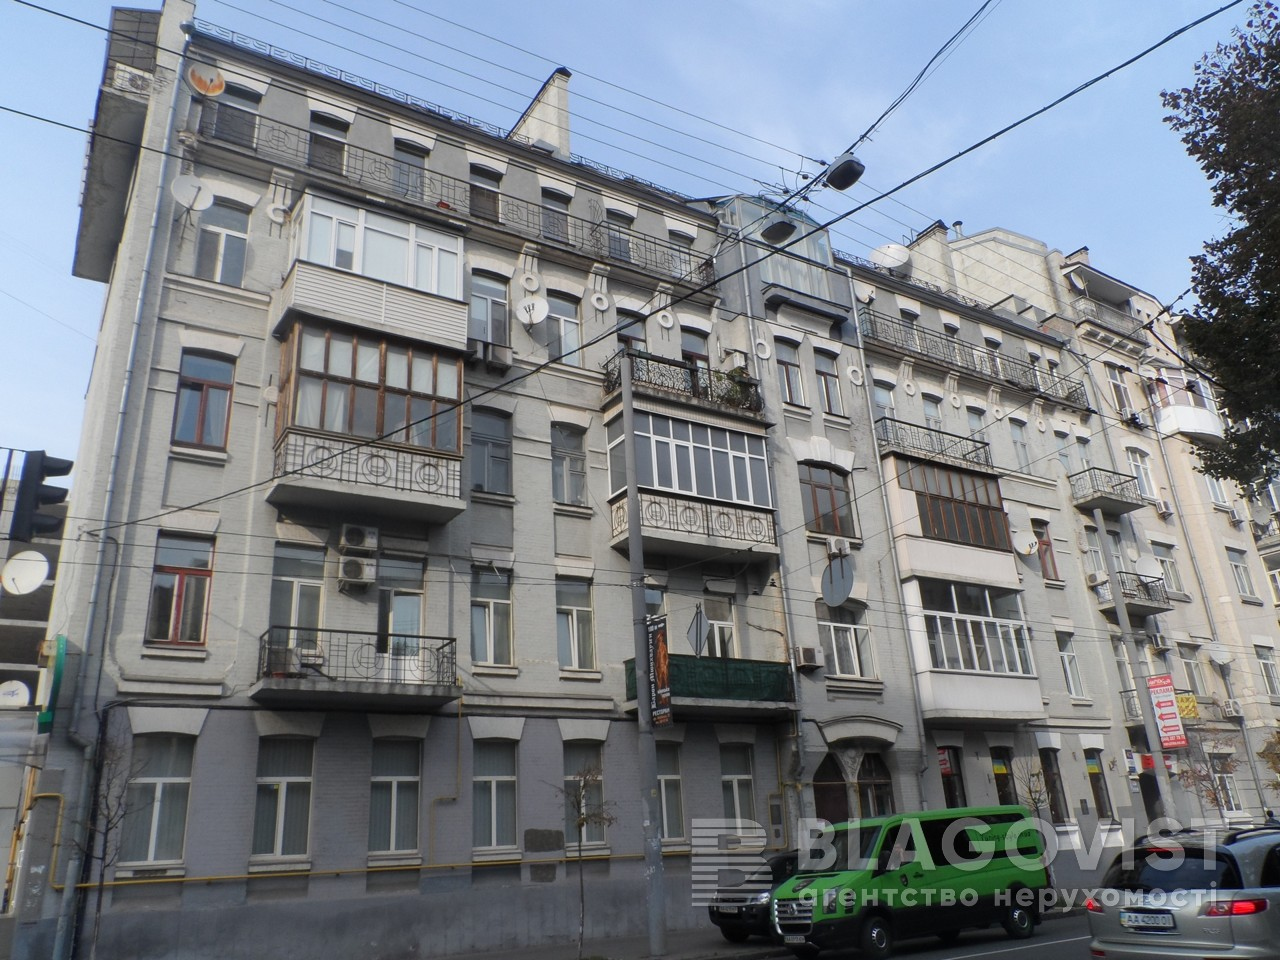 Квартира F-37098, Сечевых Стрельцов (Артема), 42, Киев - Фото 1